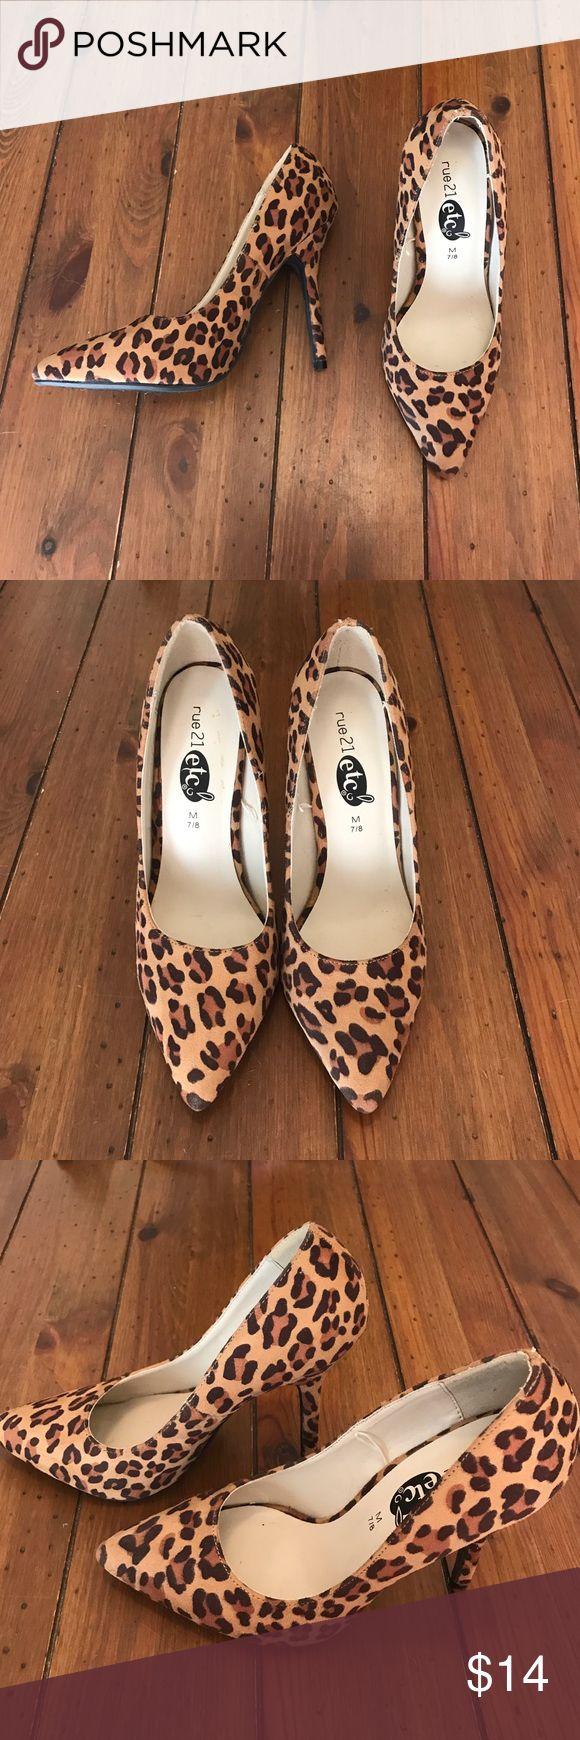 "Rue 21 Leopard Heels Black and Tan Rue 21 4"" Heels Rue 21 Shoes Heels"